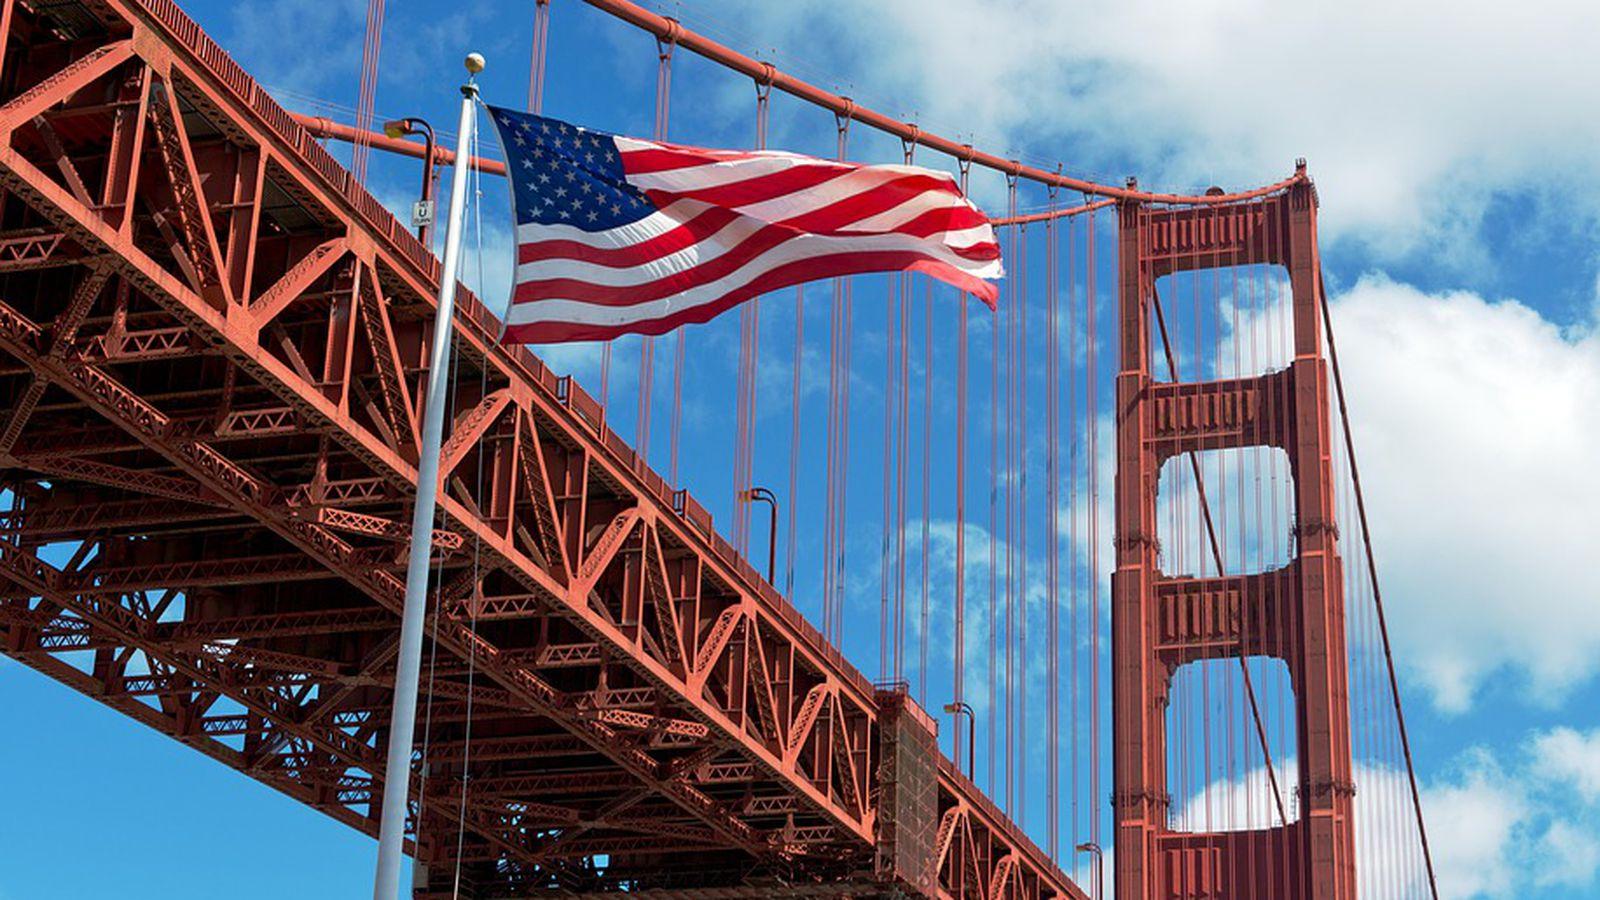 Terrorism Fears Will Close Half Of Golden Gate Bridge For